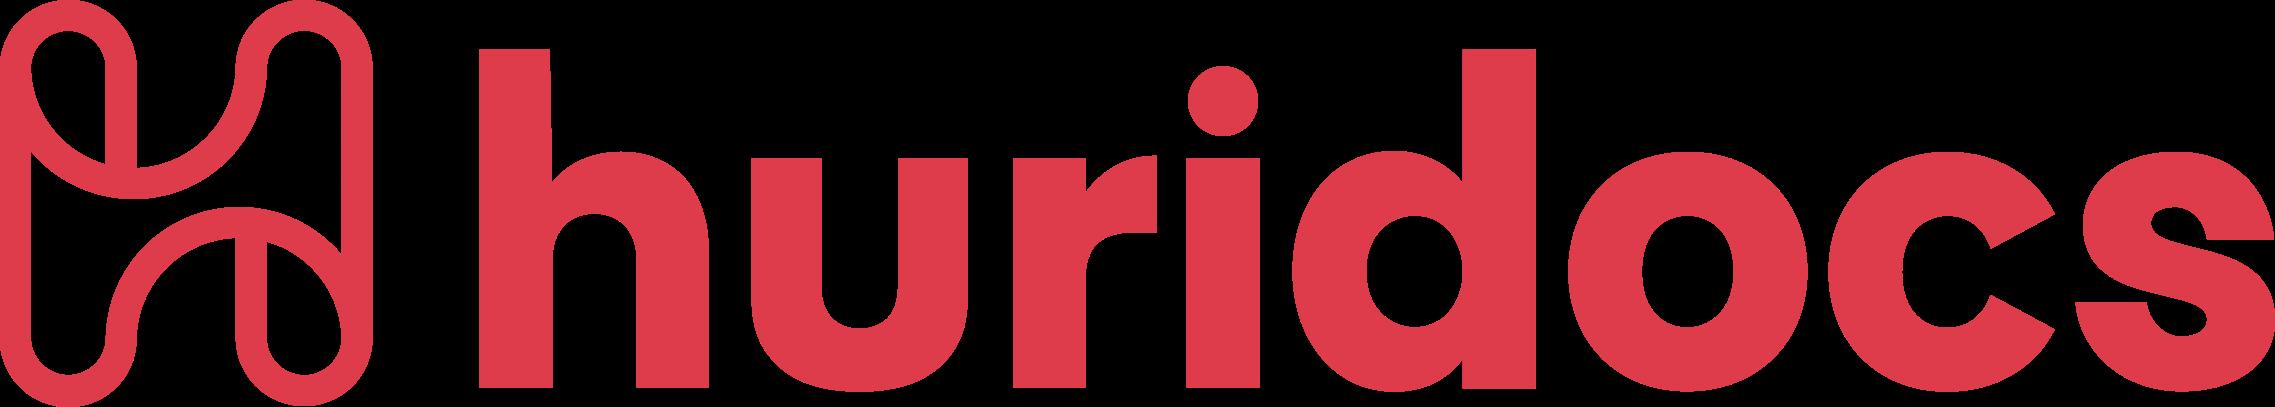 HURIDOCS